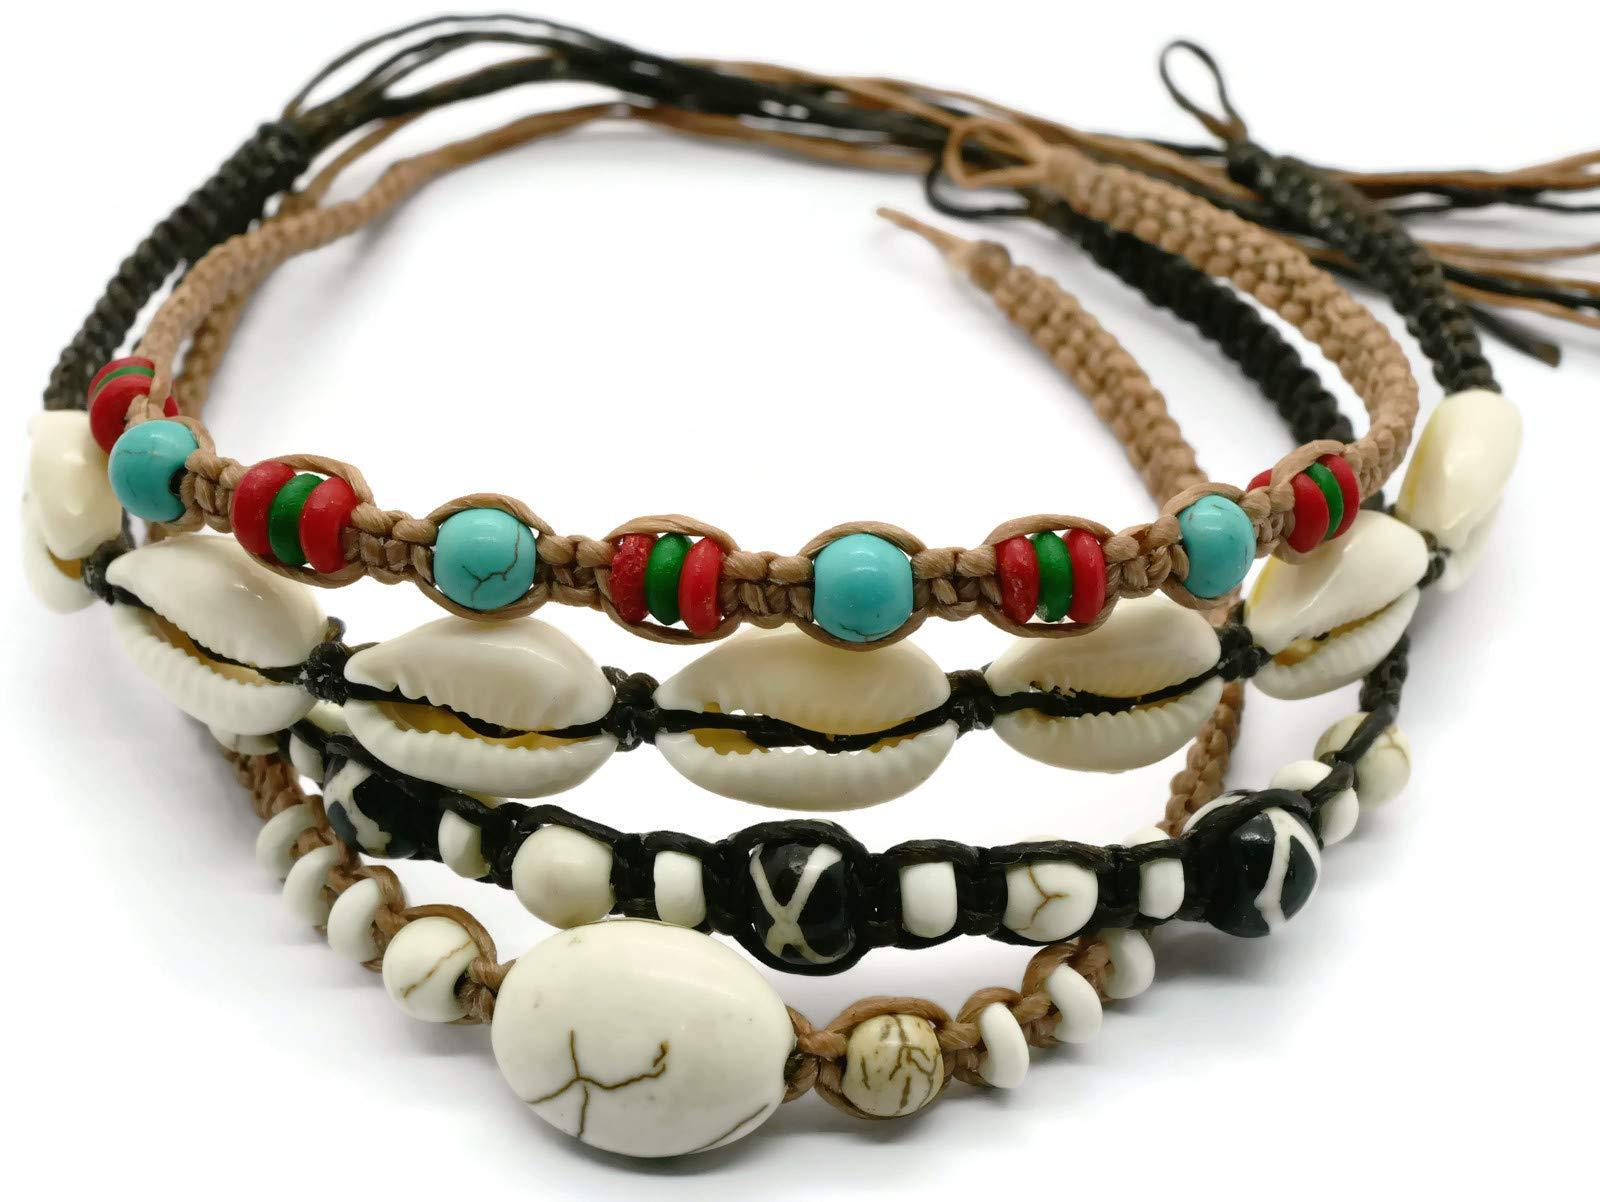 BrownBeans, Macrame Cord Reggae Summer Casual Wear Anklet Ankle Bracelet for Large Ankle (CAKT10001) (L)